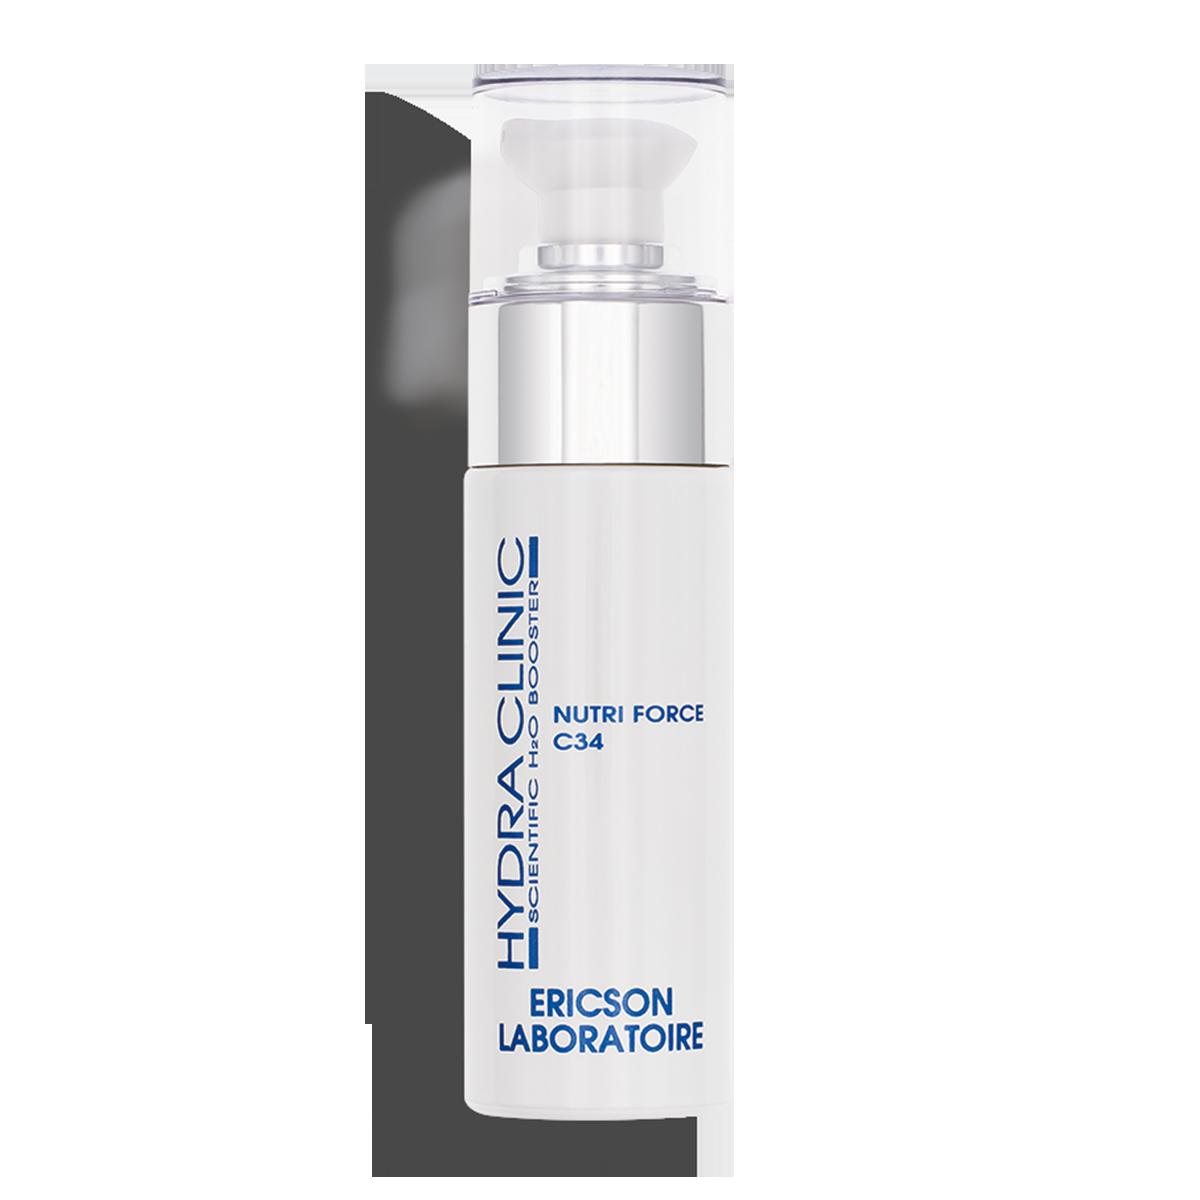 Hydra Clinic E797 - Tinh chất cấp nước dành cho da khô Ericson Hydra Clinic Nutri Force C34 Repair Serum